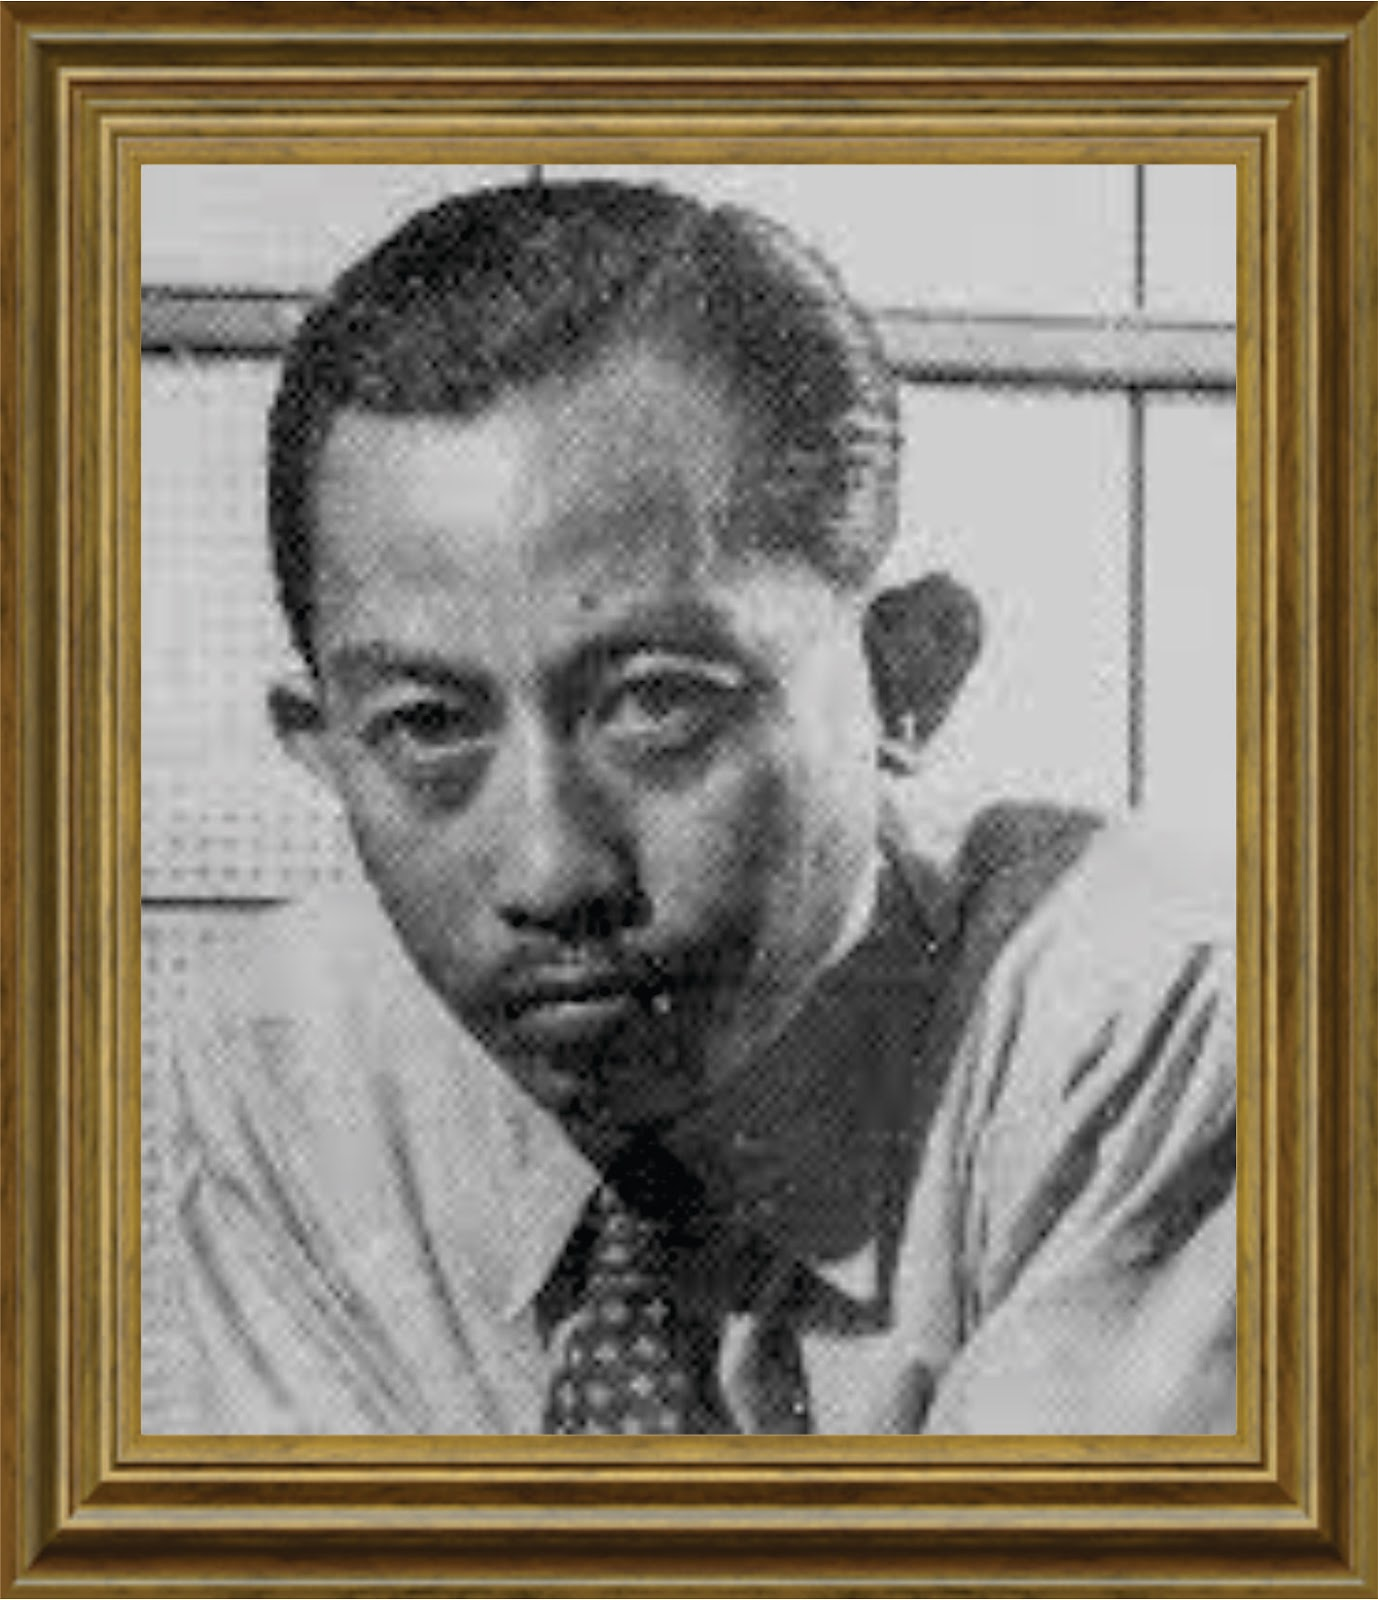 Biografi Ismail Marzuki Sekitar Musik